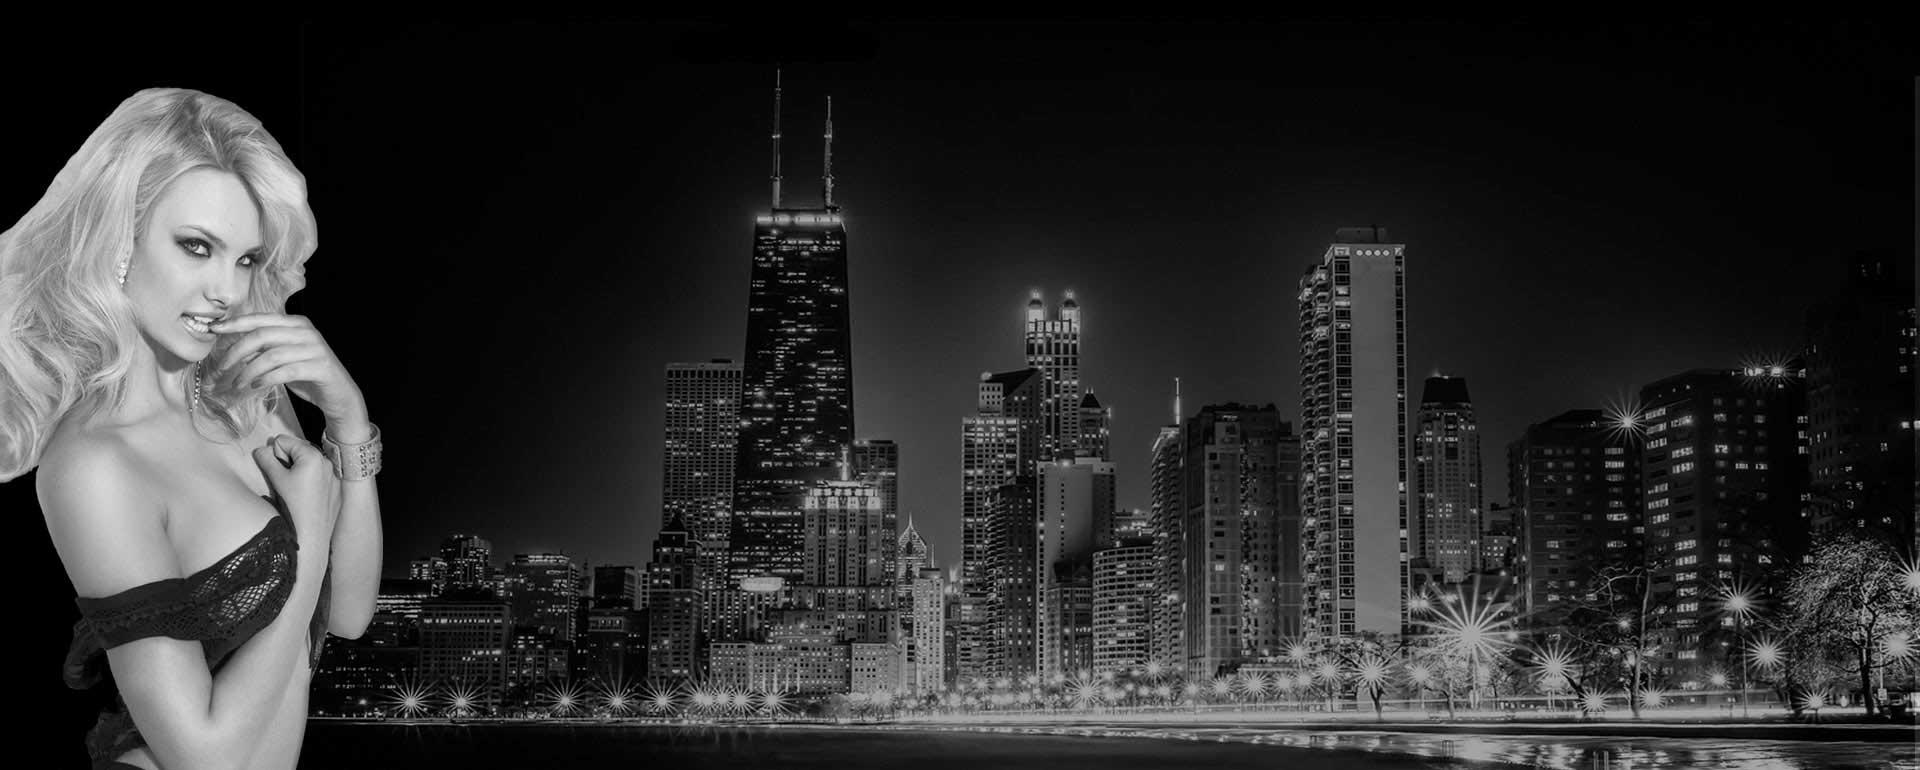 Rick's Cabaret l #1 Strip Club Chicago